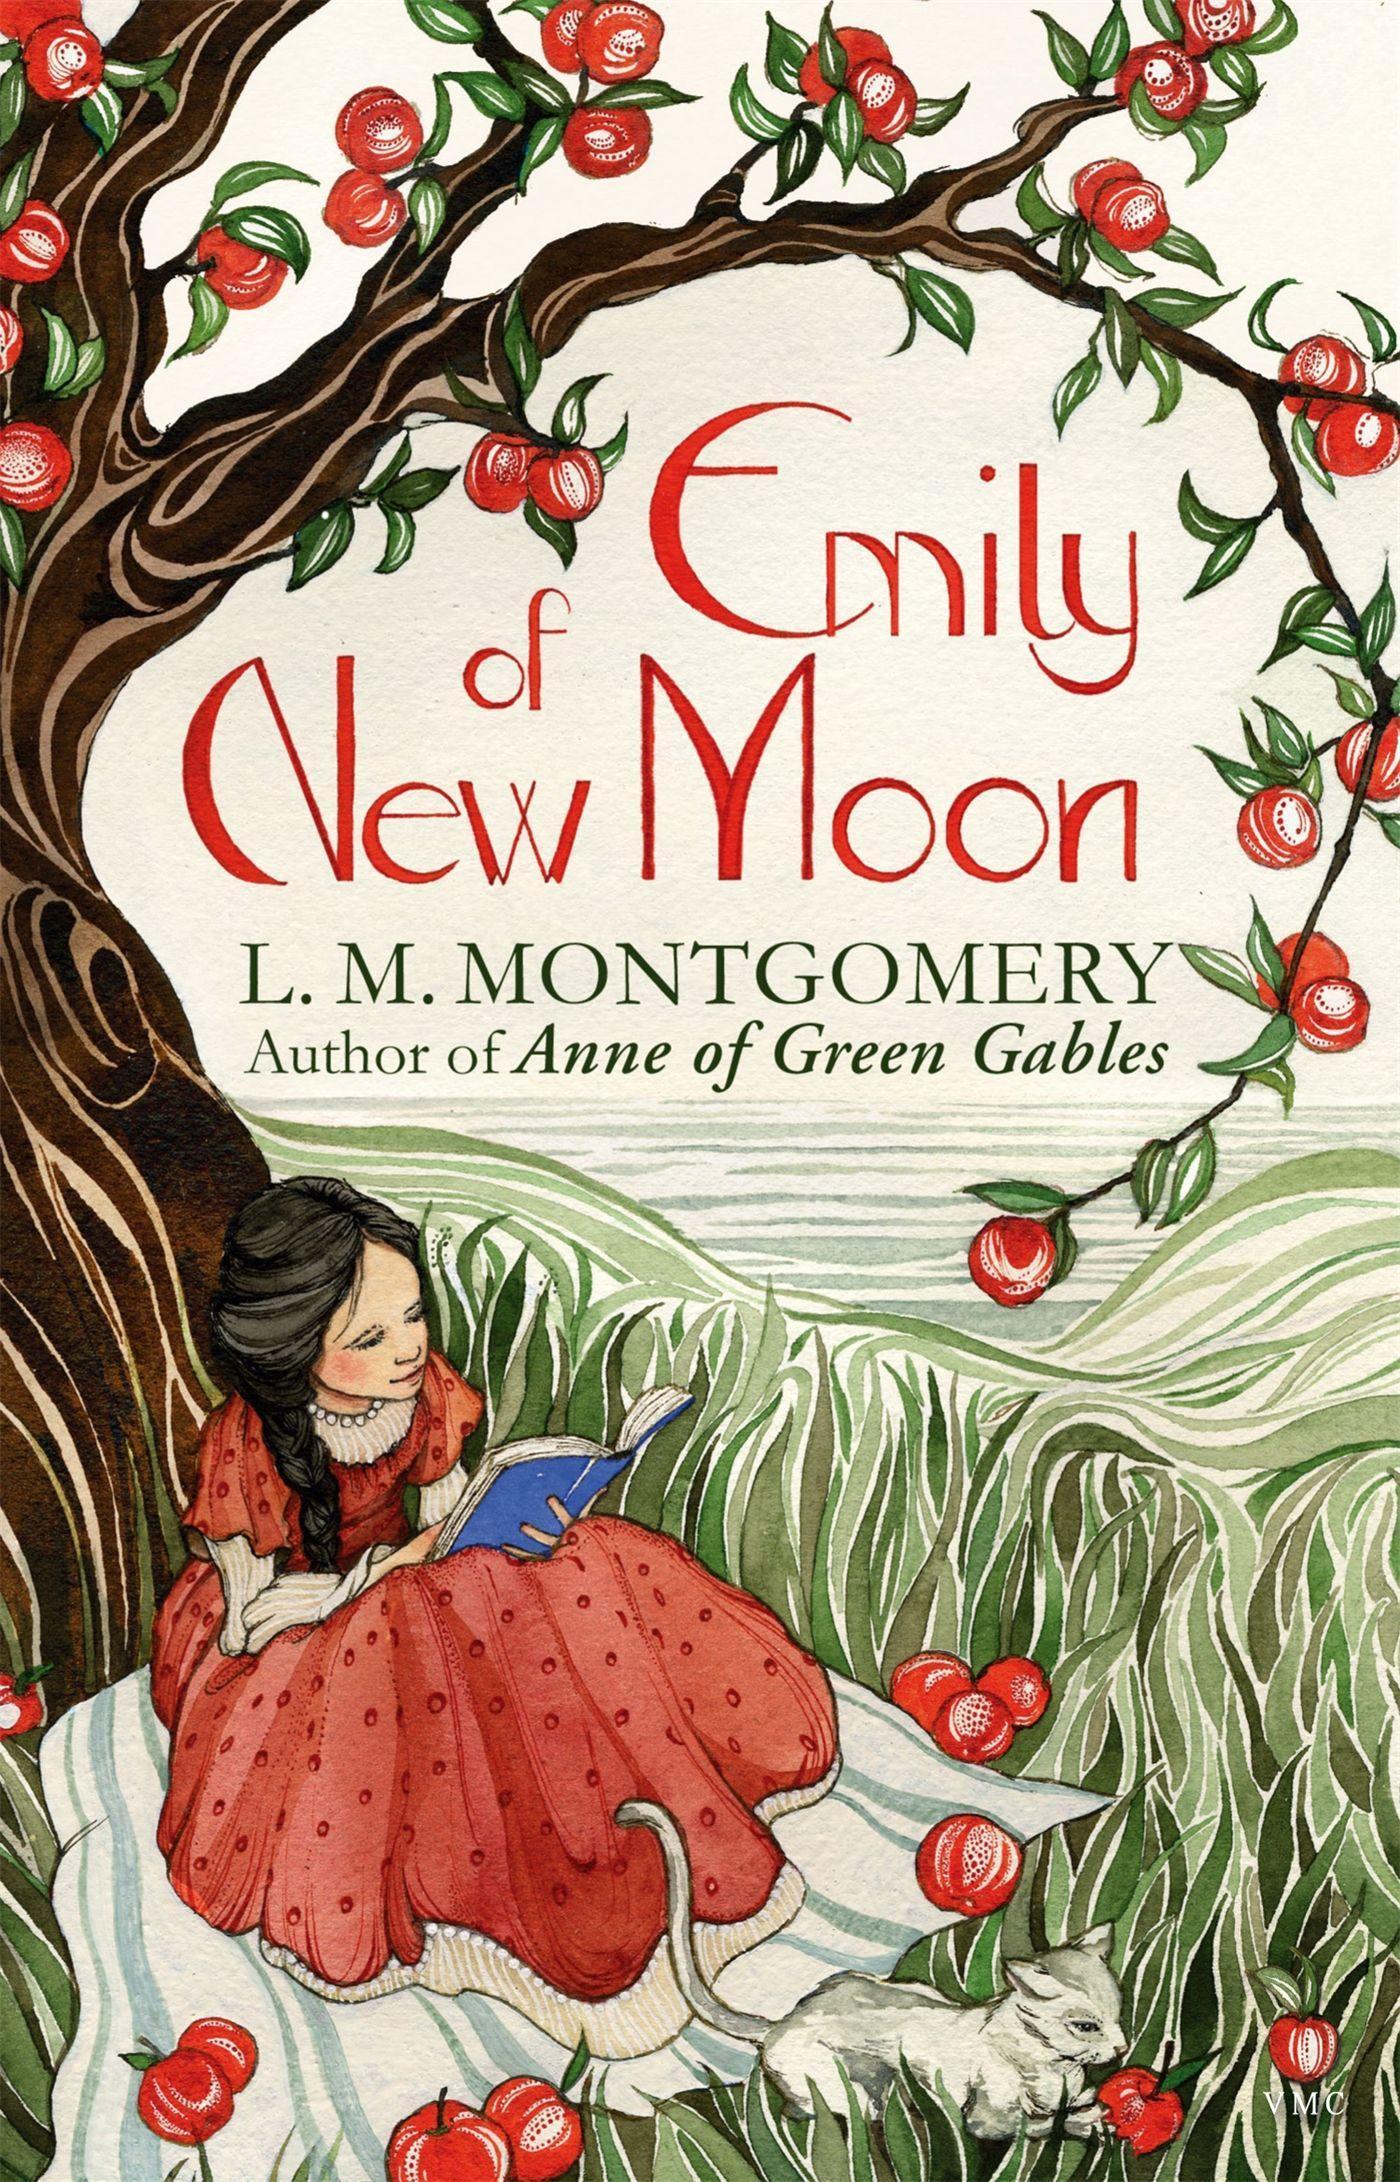 Emily of New Moon, Lucy Maud Montgomery